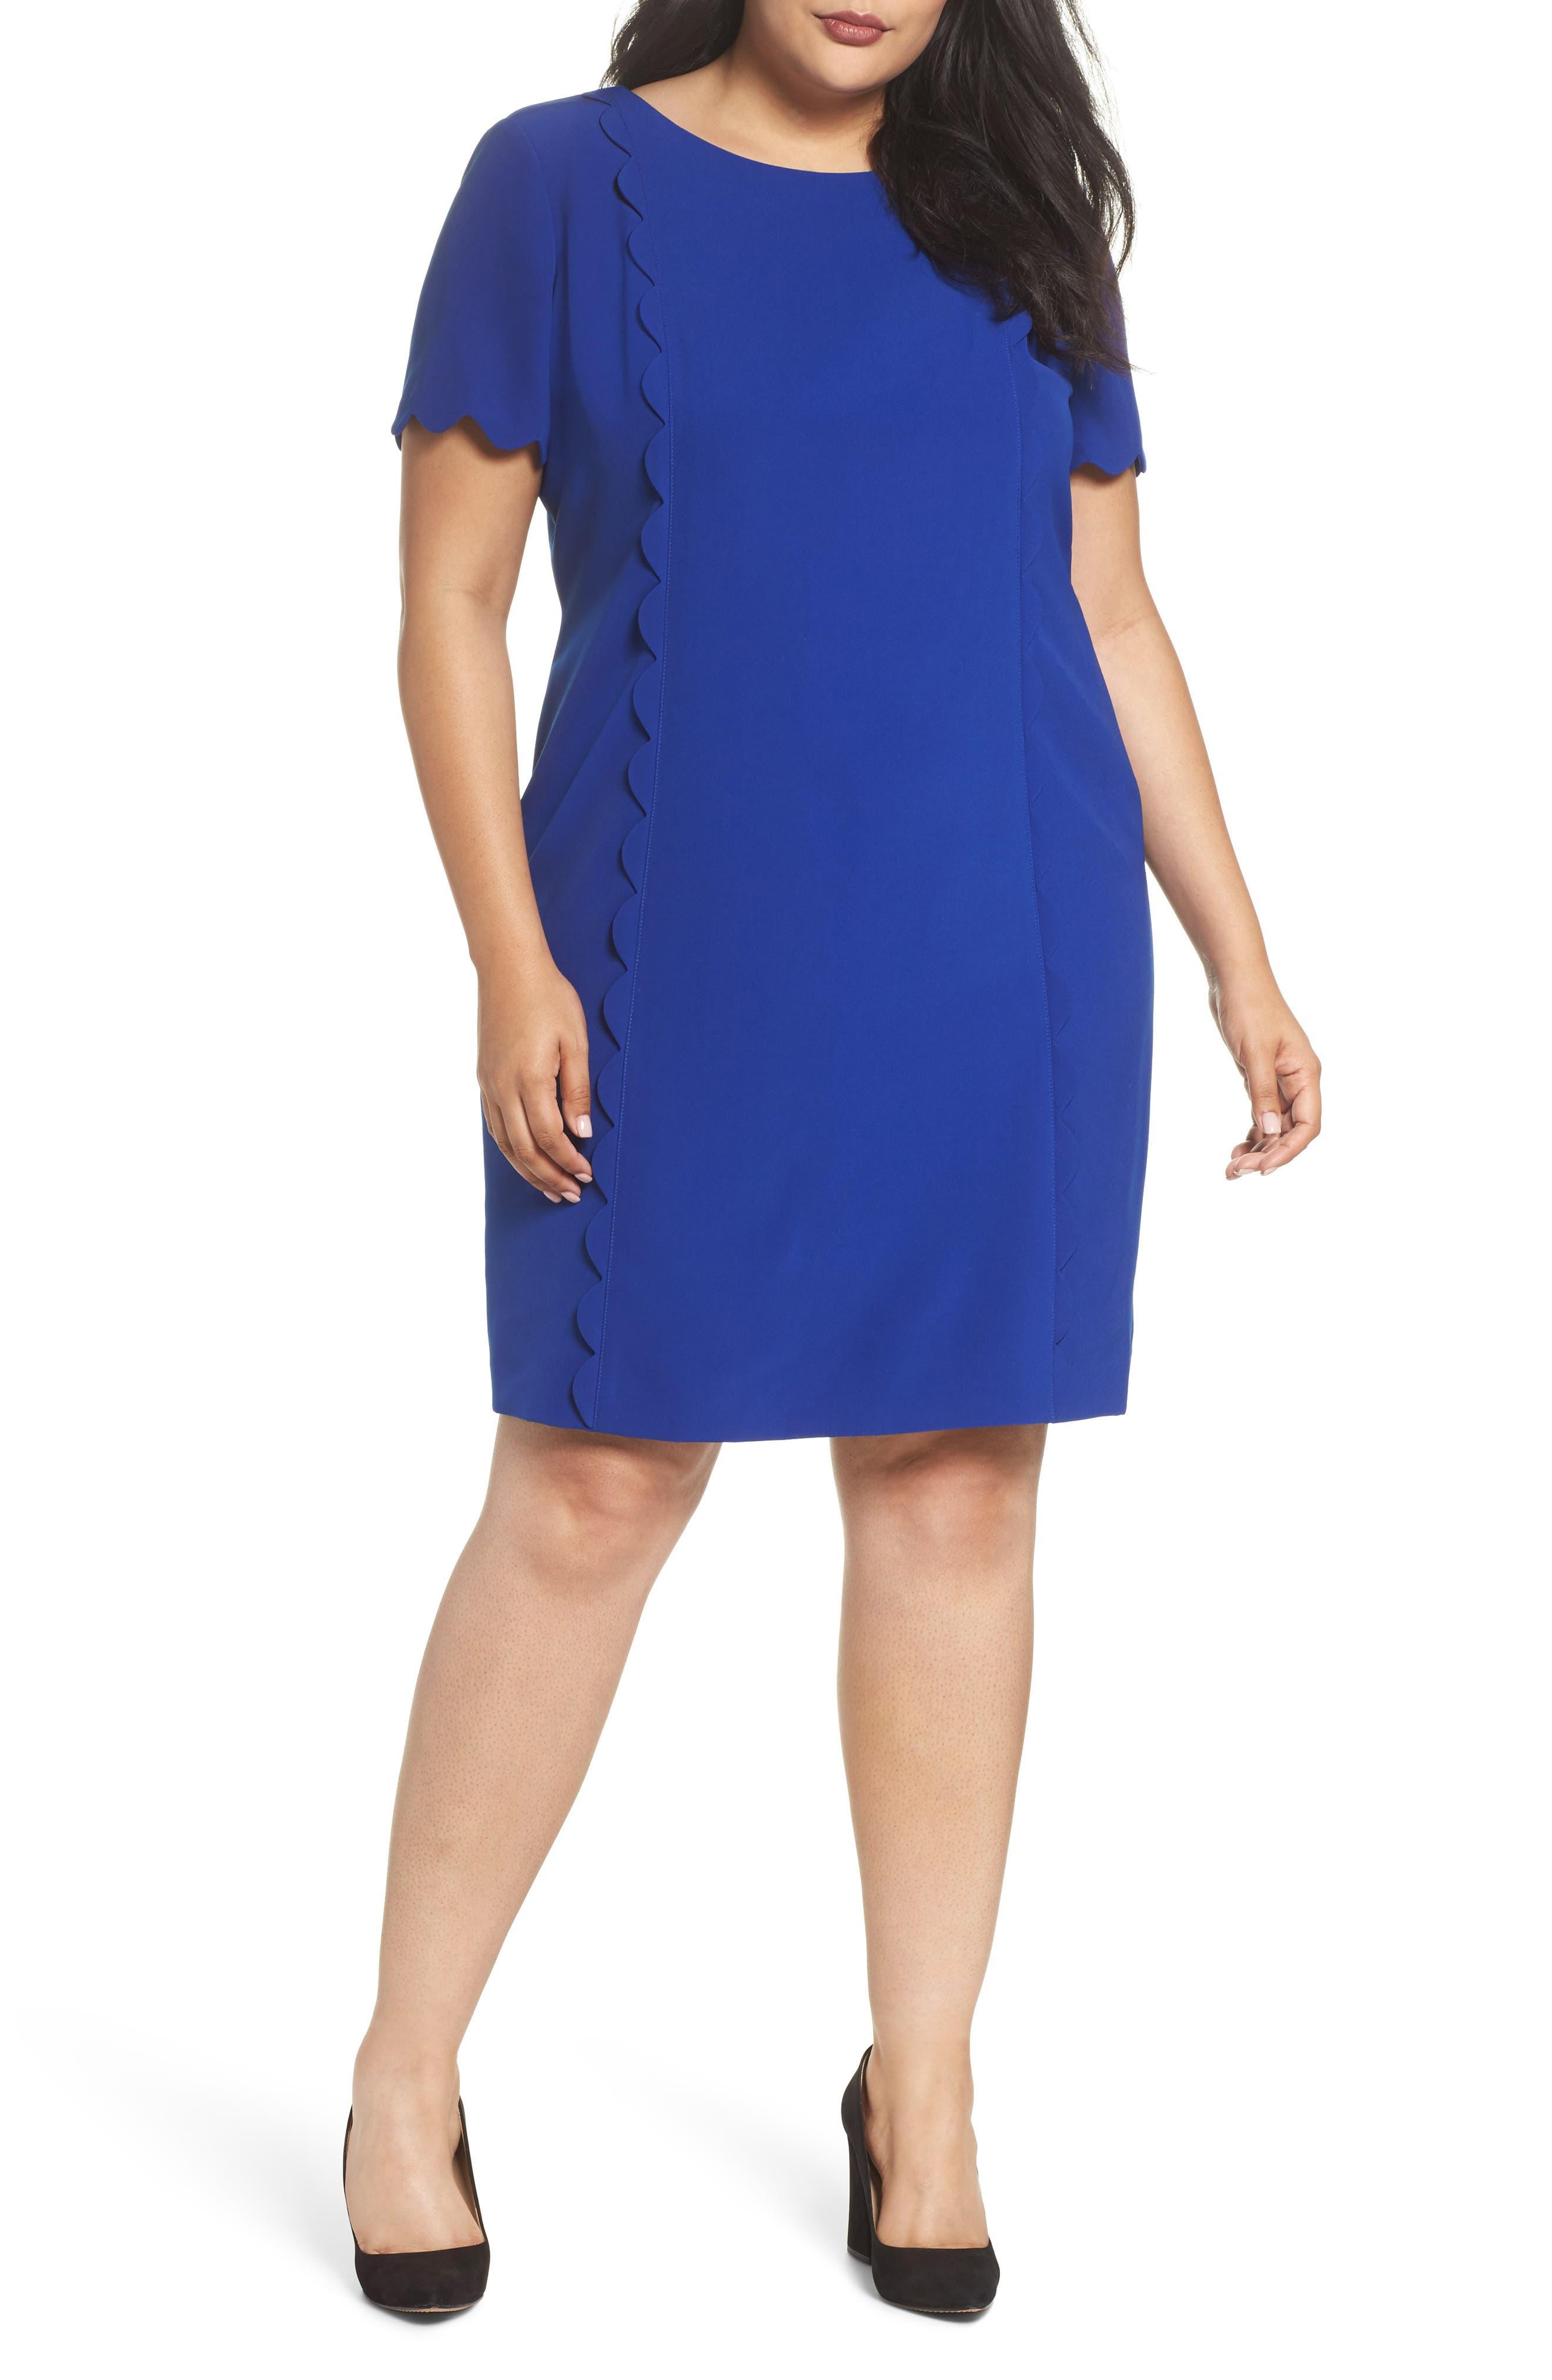 Alternate Image 1 Selected - Tahari Scalloped Trim Shift Dress (Plus Size)